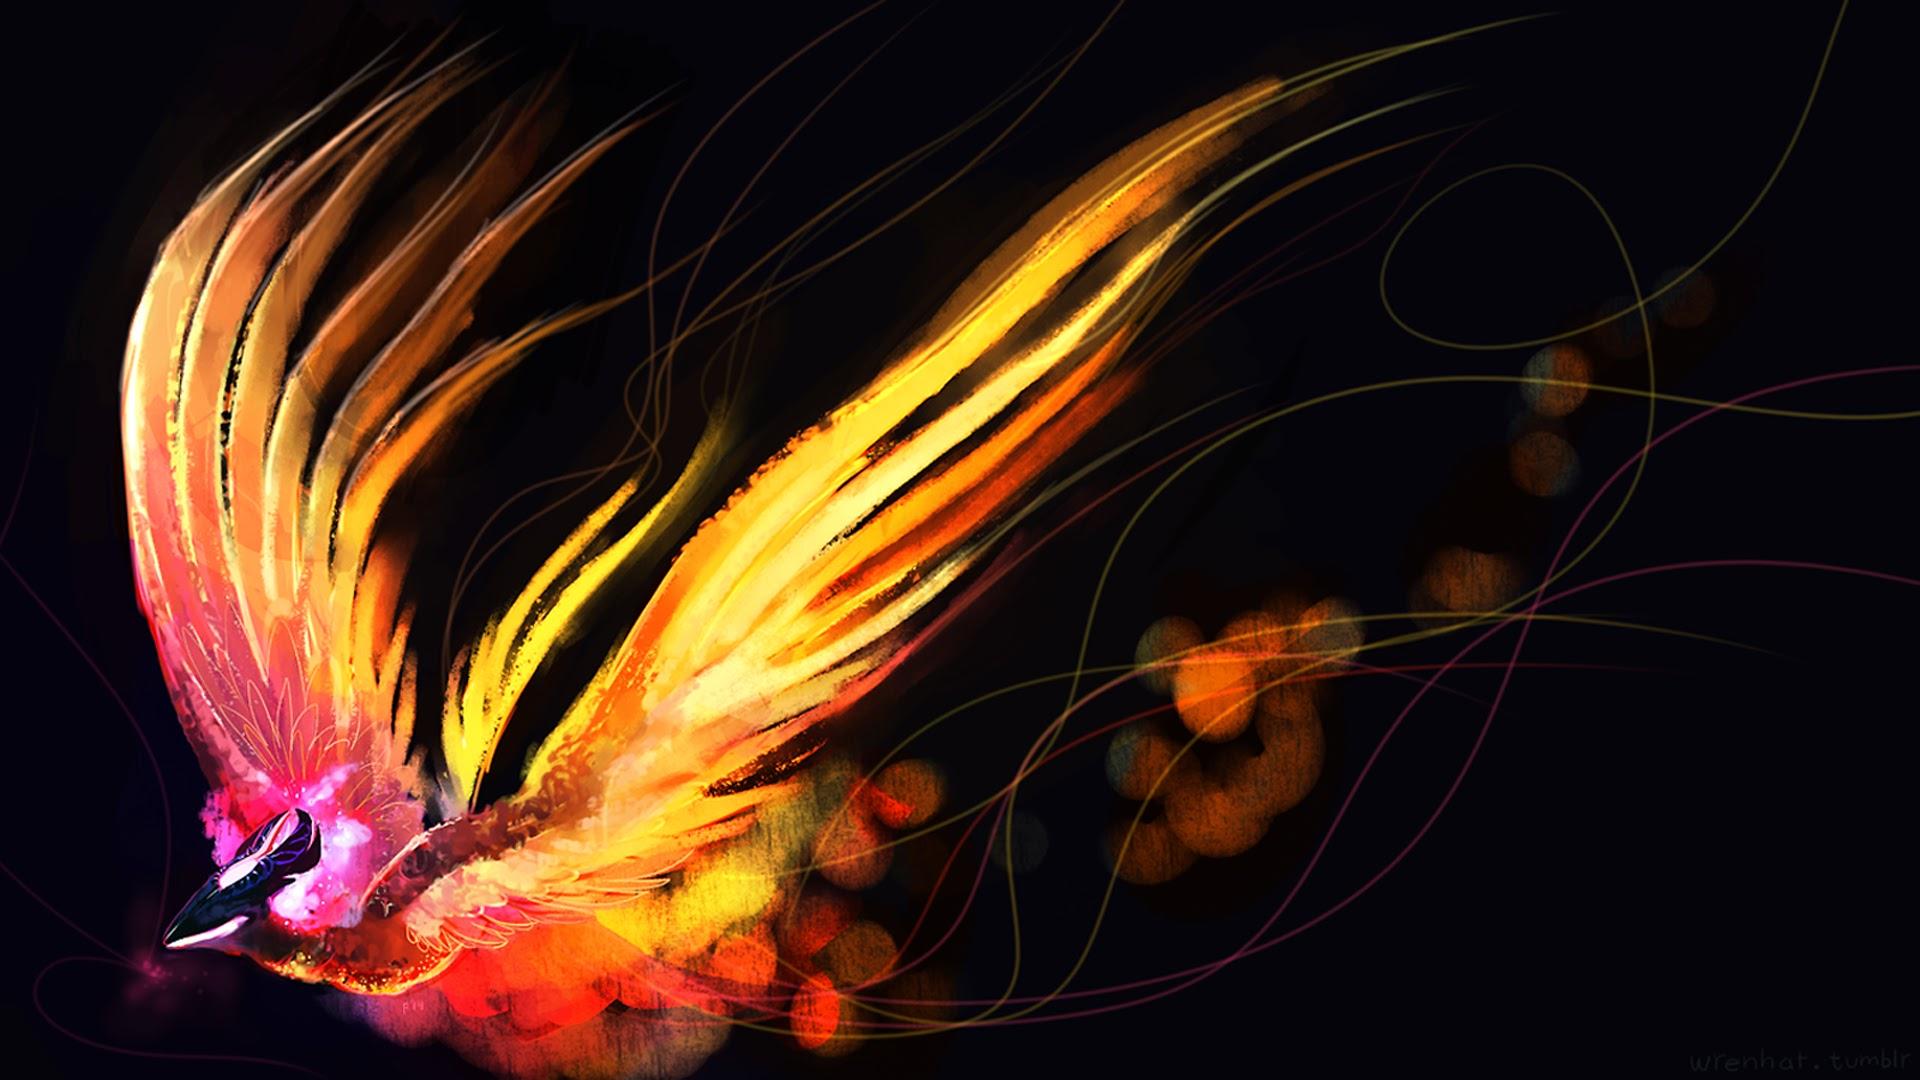 Phoenix Wallpaper HD - WallpaperSafari Fire And Ice Dragon Wallpaper